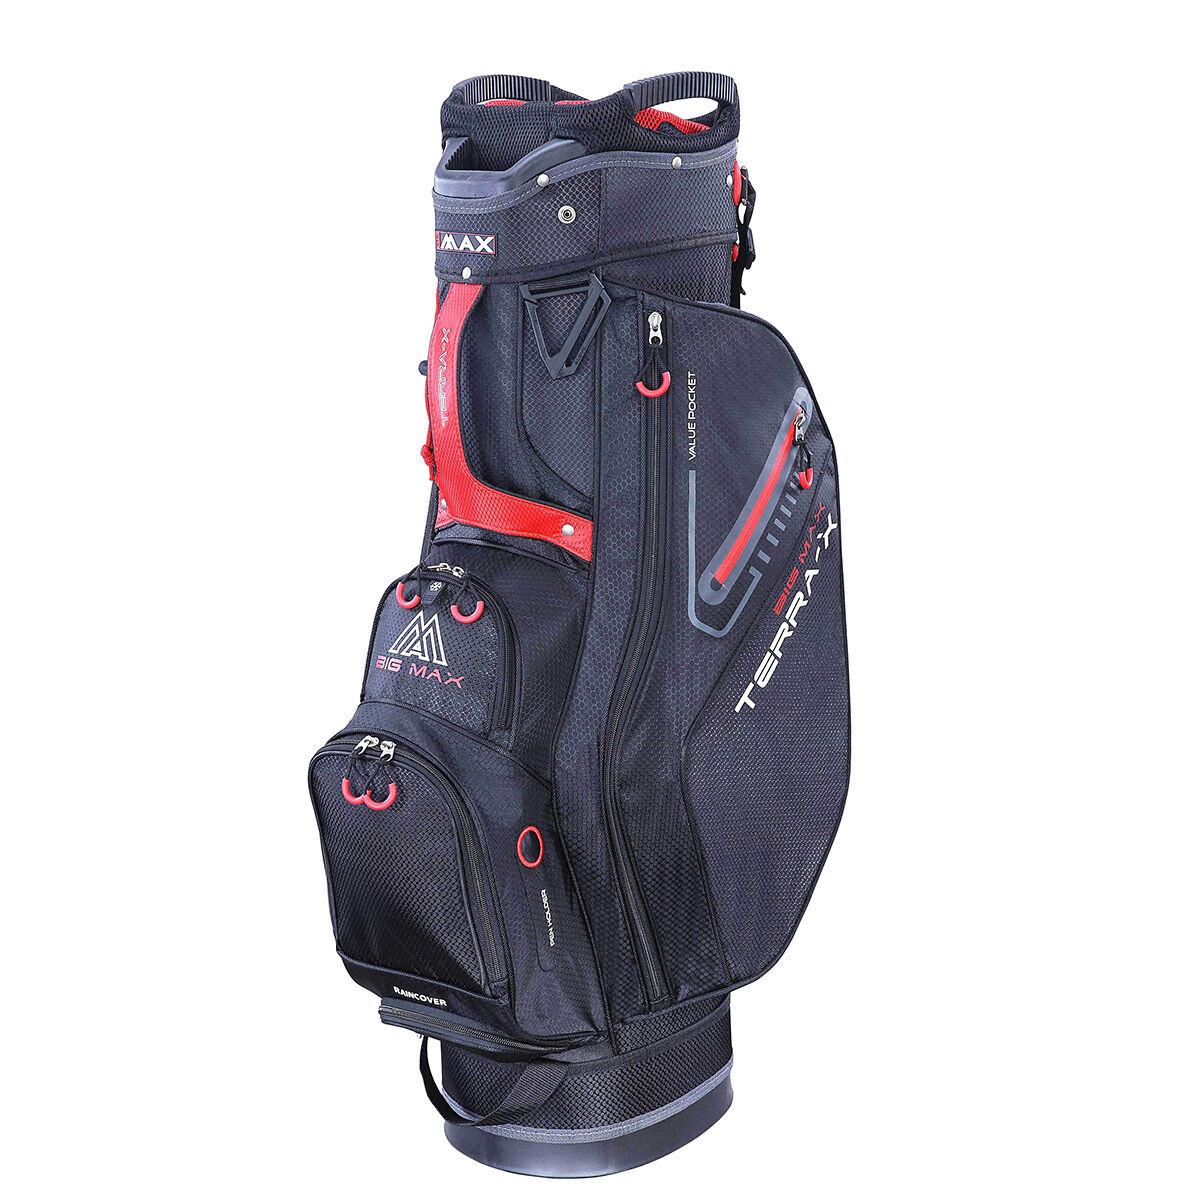 BIG MAX Terra X Golf Cart Bag, Black red, One Size | American Golf